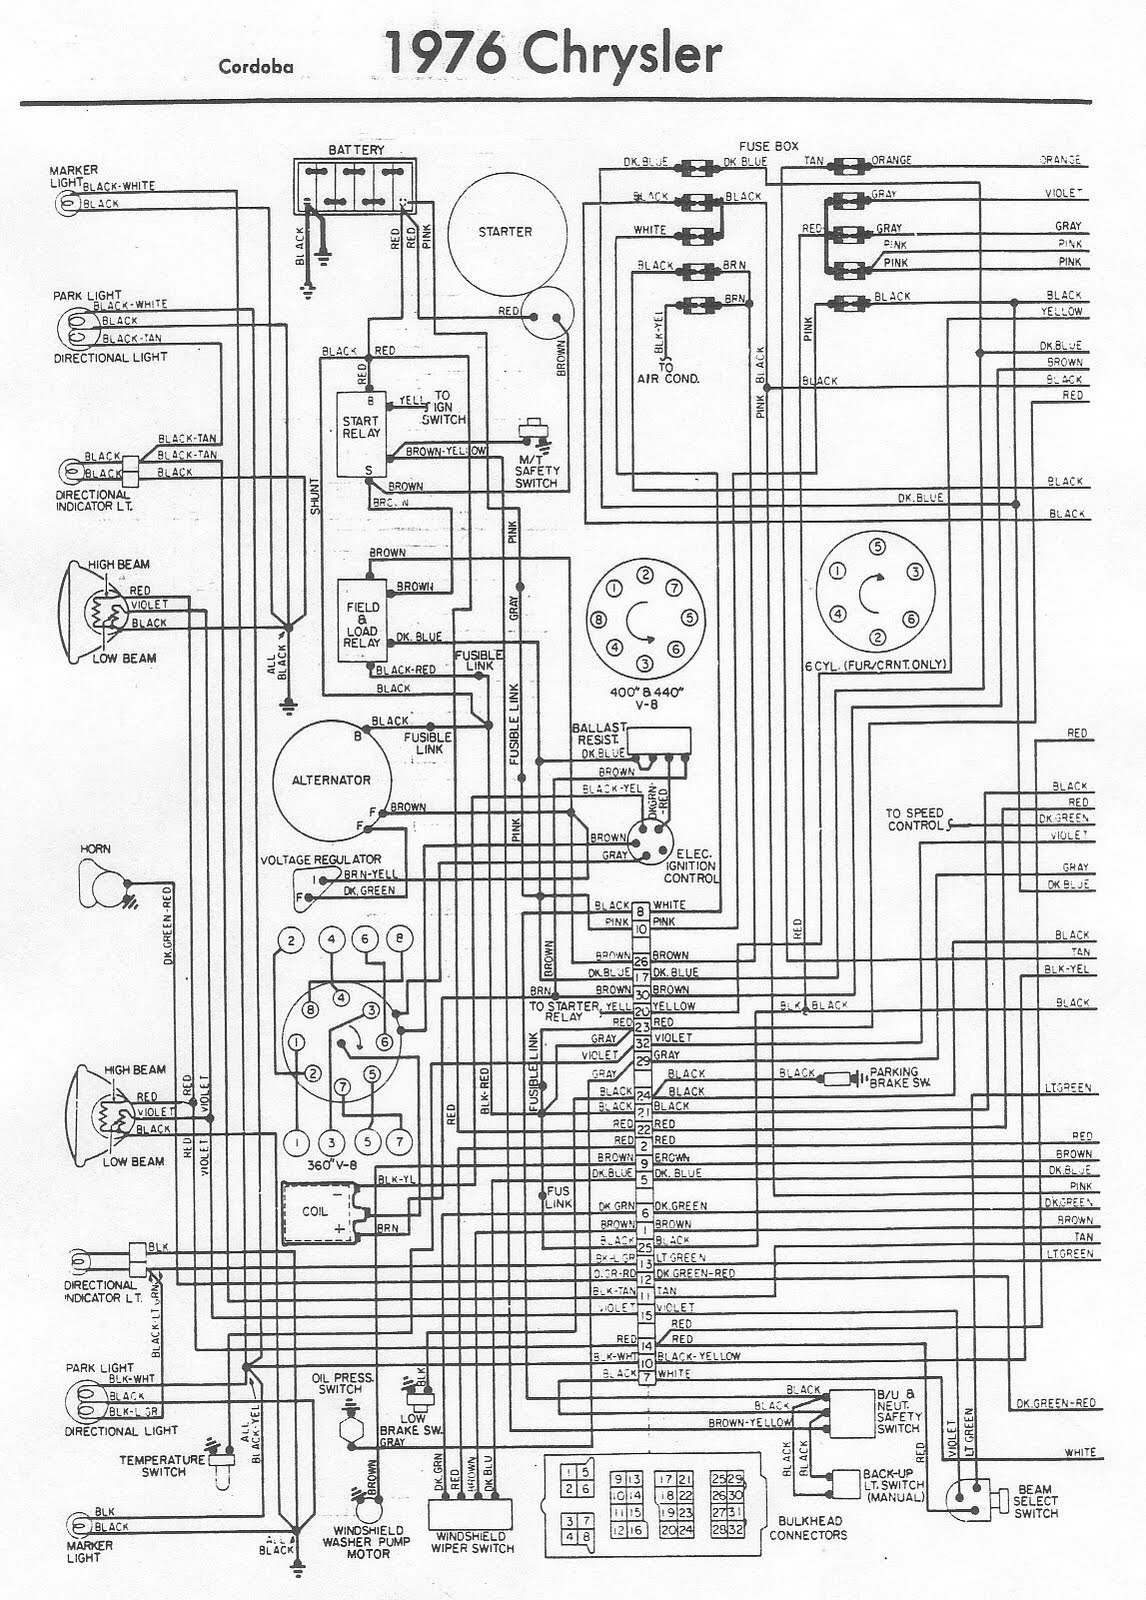 similiar chrysler fuse box diagram keywords diagram 1976 chrysler cordoba engine compartment wiring diagram acircmiddot 1985 chrysler lebaron fuse box